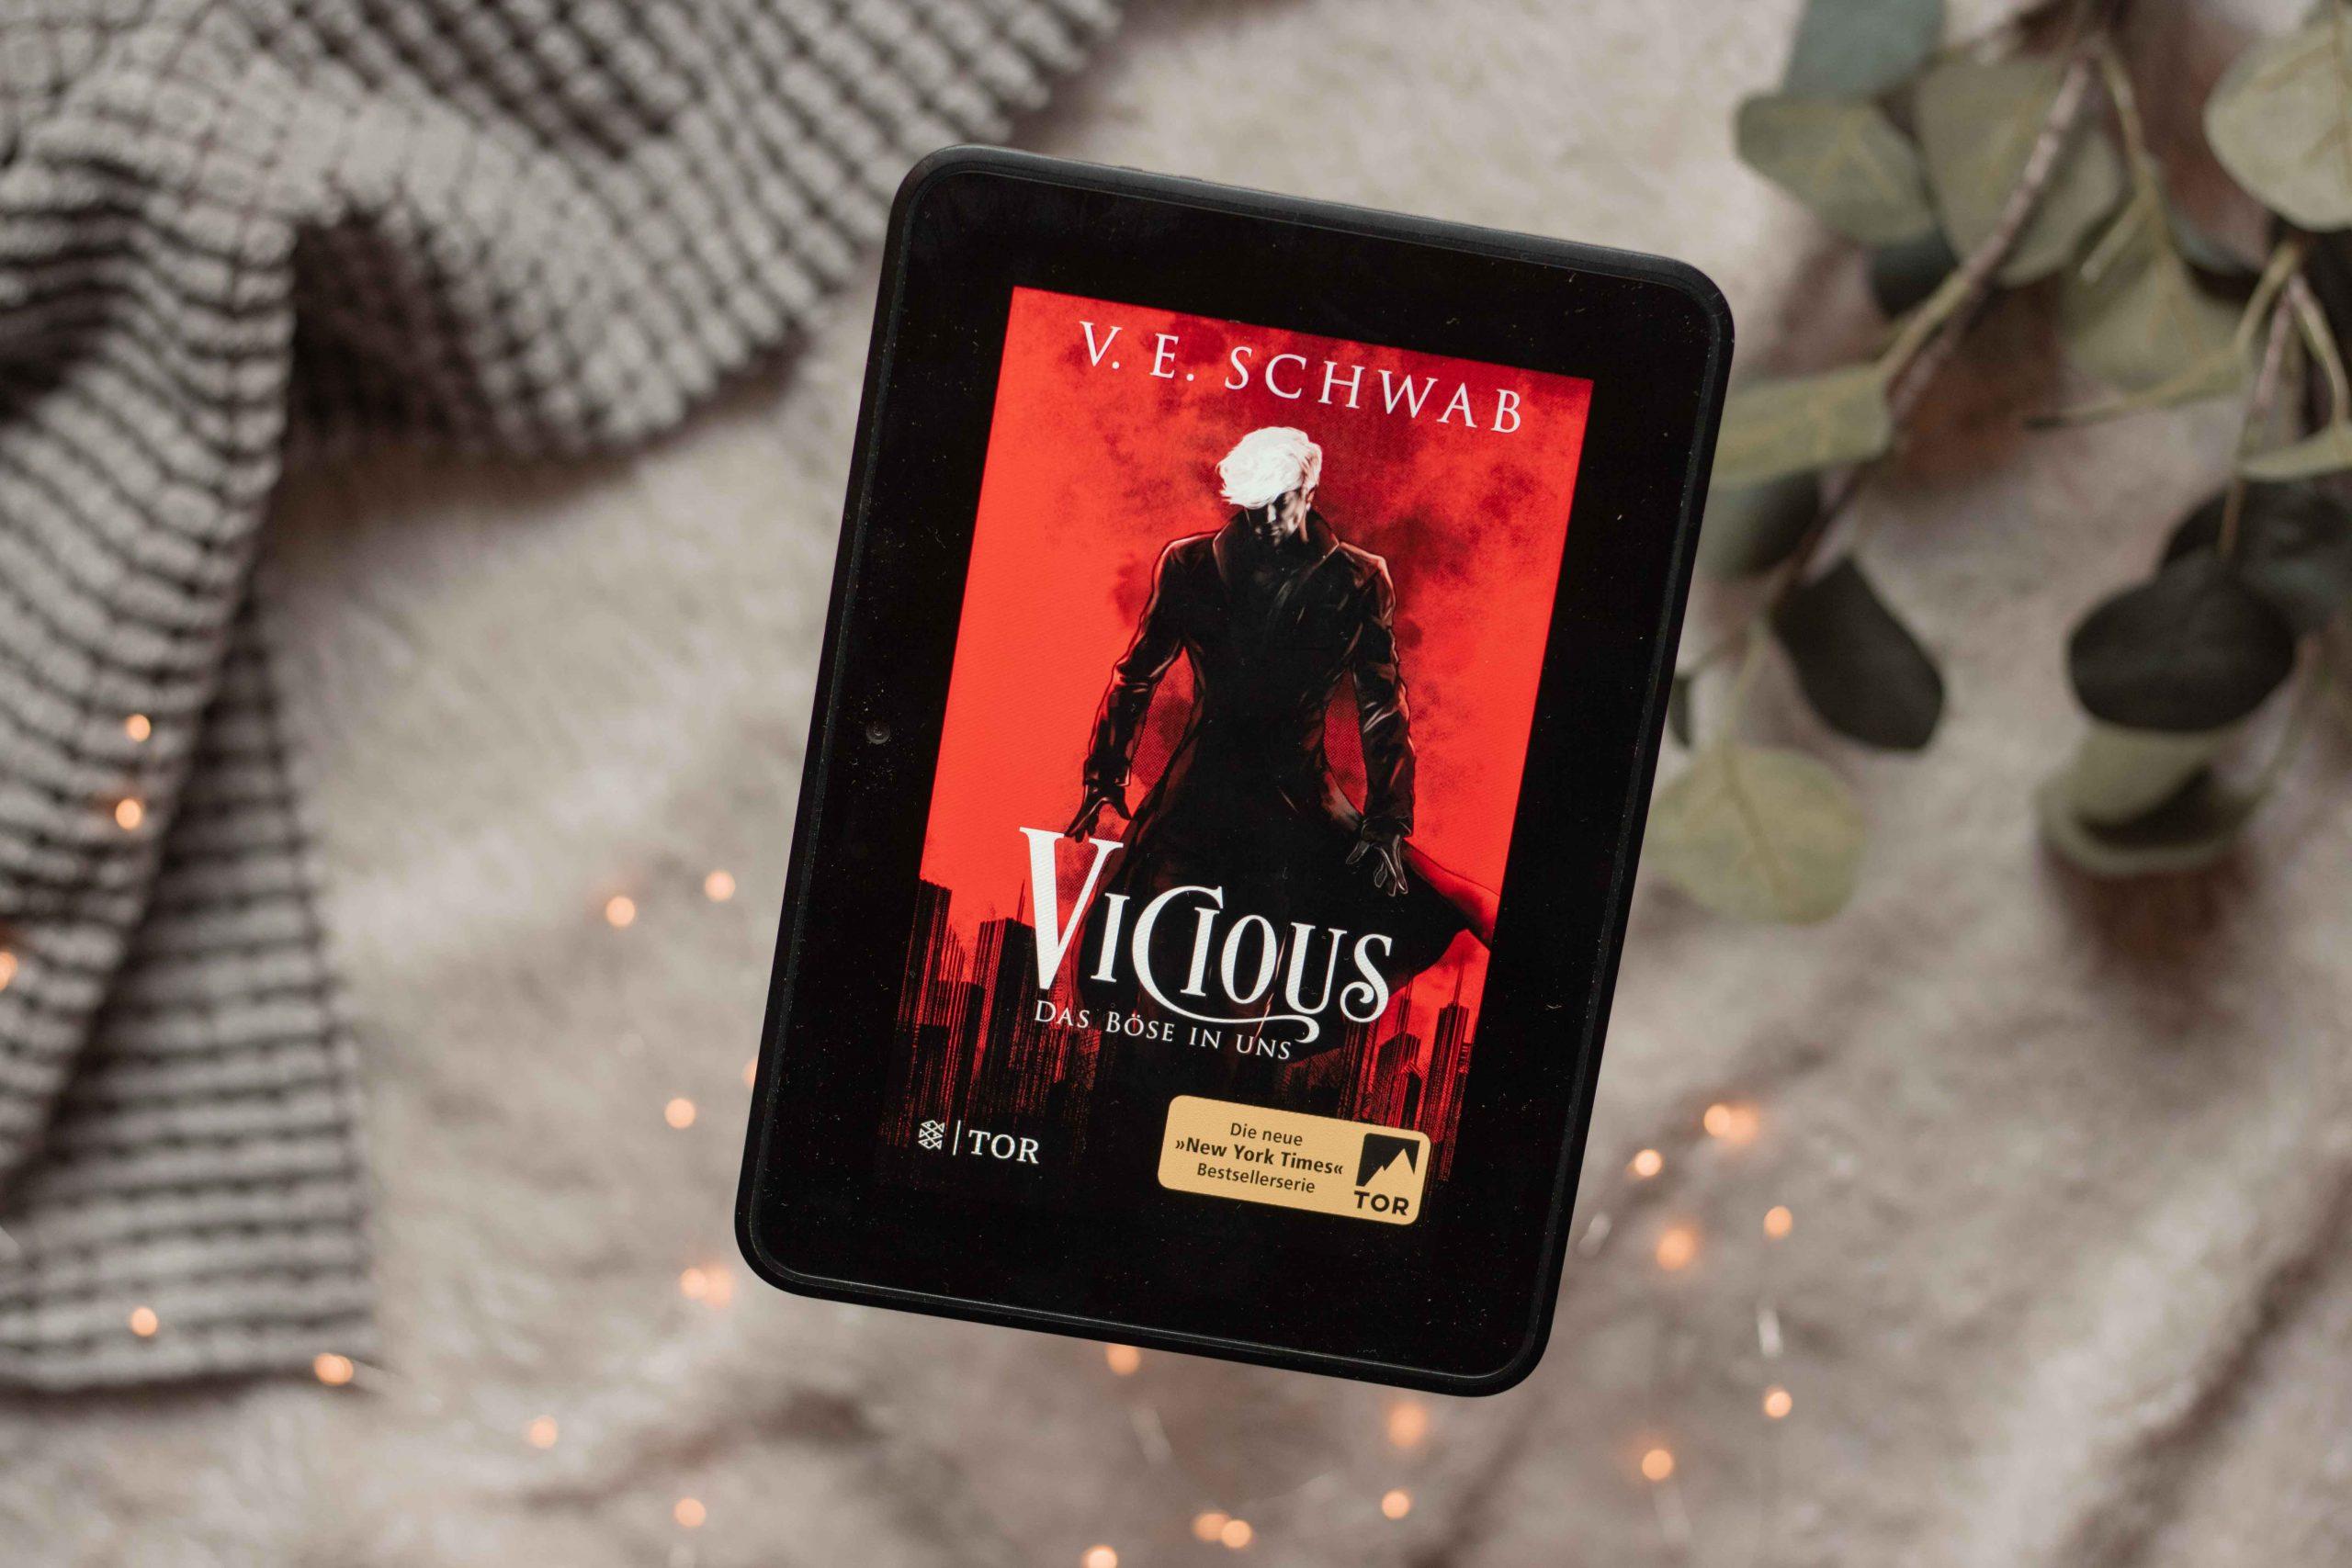 Vicious – Das Böse in uns | V.E. Schwab